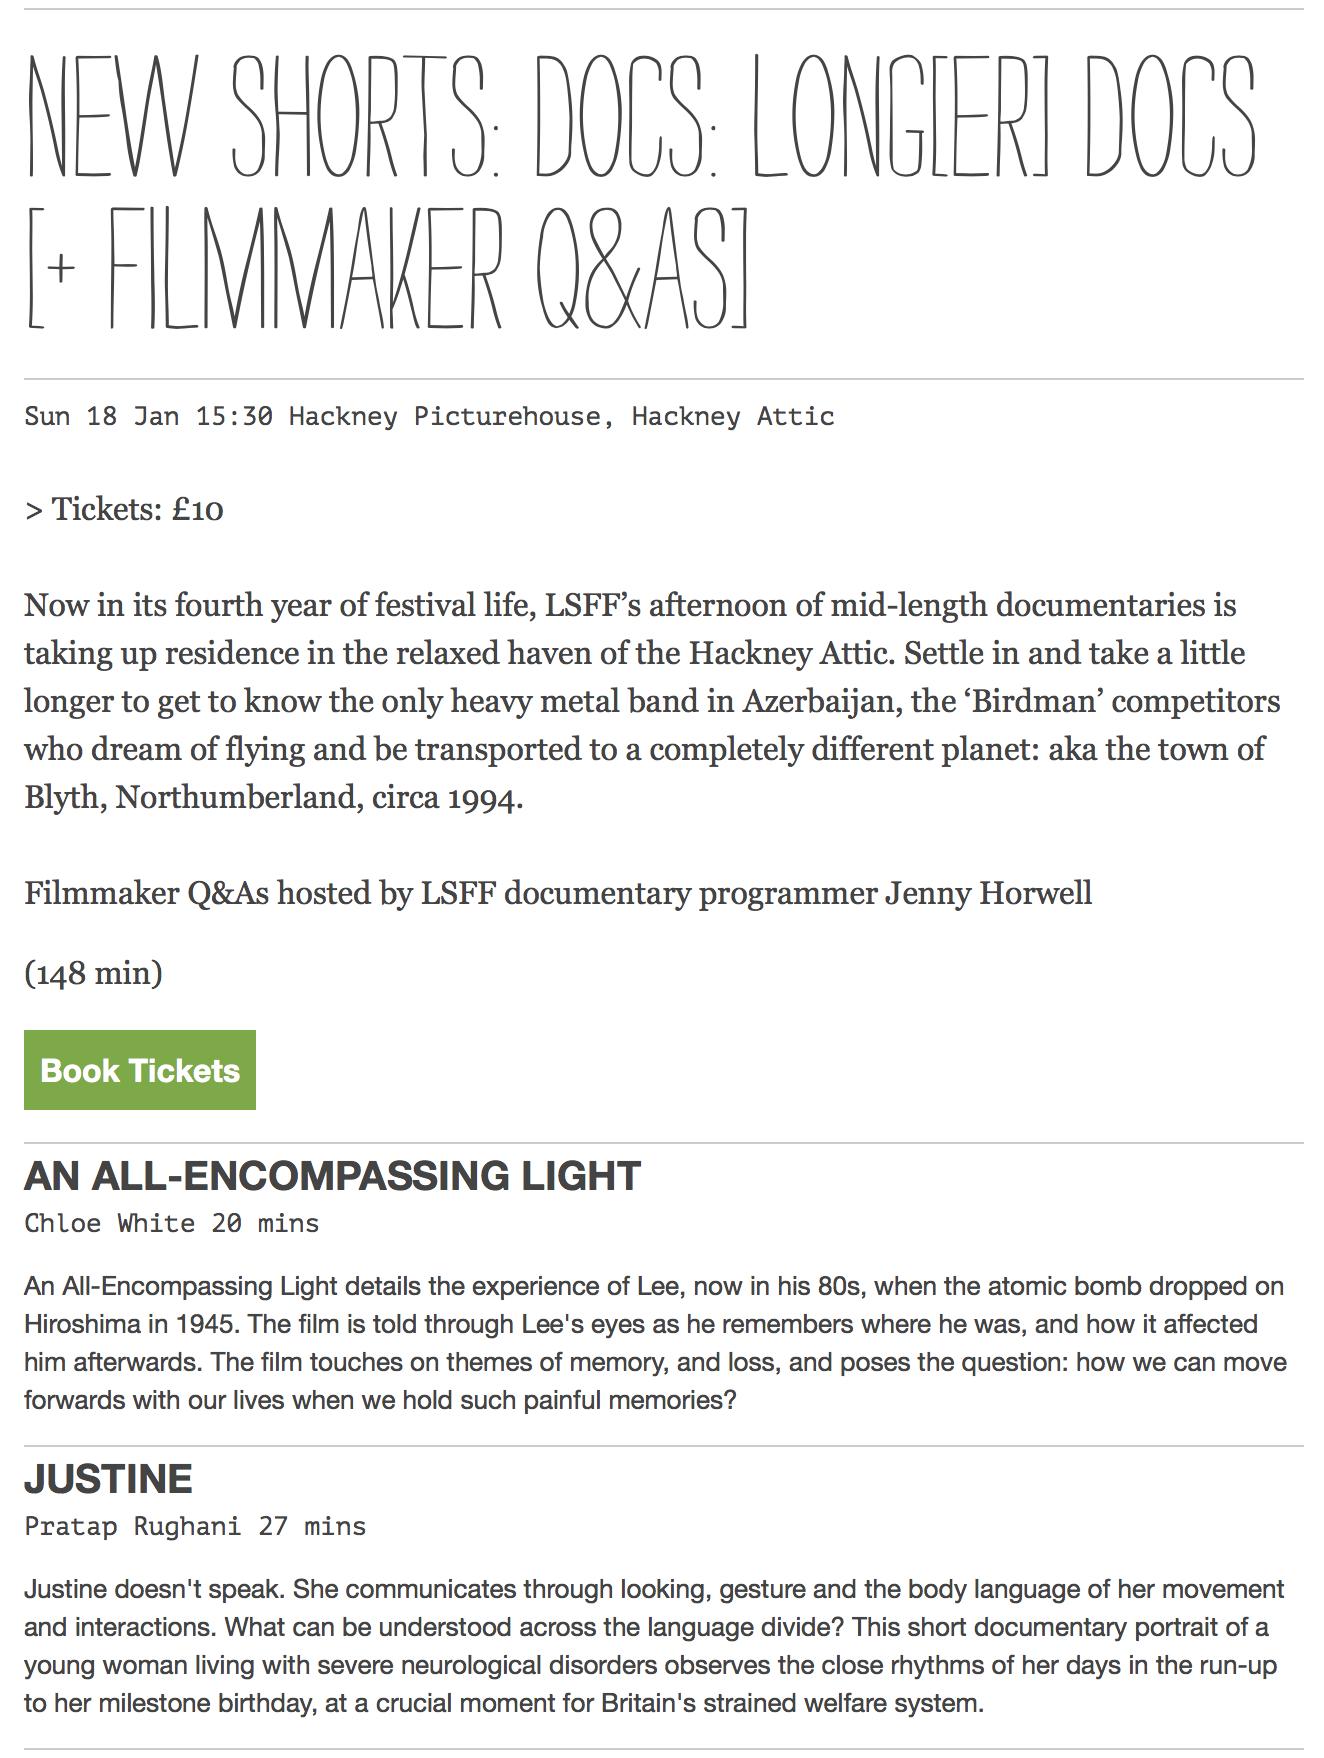 """Justine"" screening at the London Short Film Festival 18 January 2015"